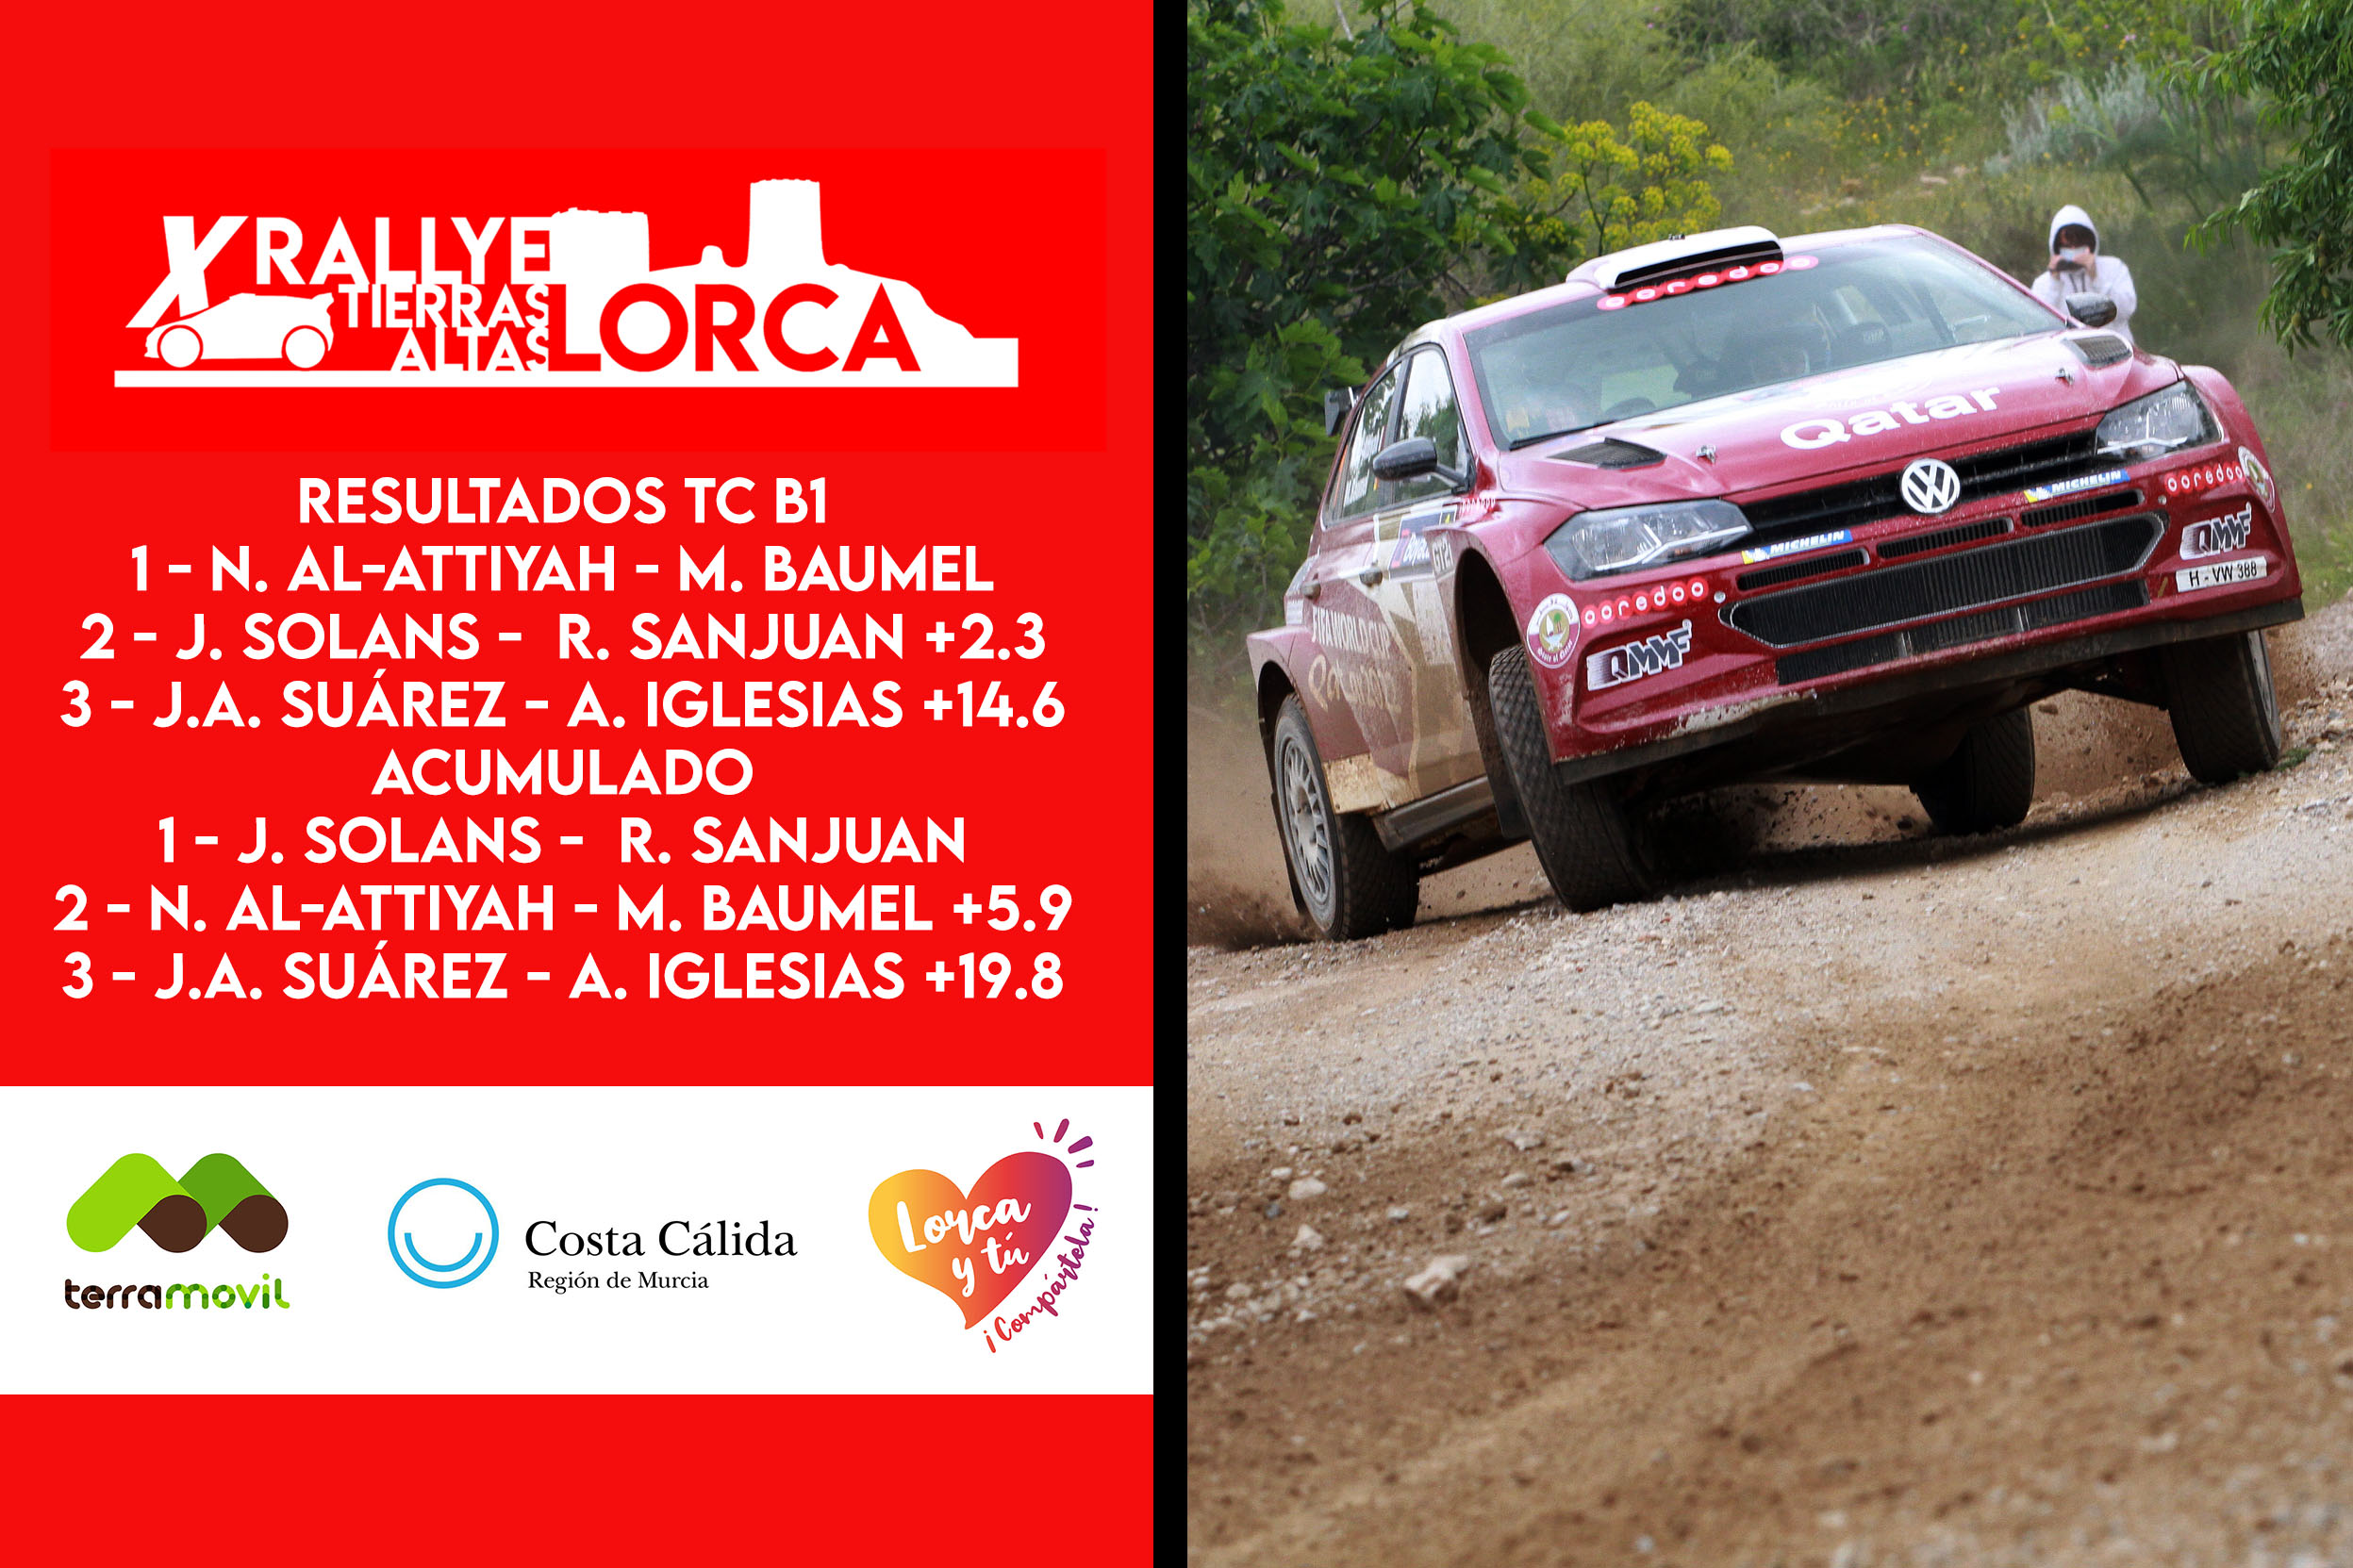 SCER + CERT: 10º Rallye Tierras Altas de Lorca [23-24 Abril] - Página 2 EzviehlXIAIo2KF?format=jpg&name=4096x4096